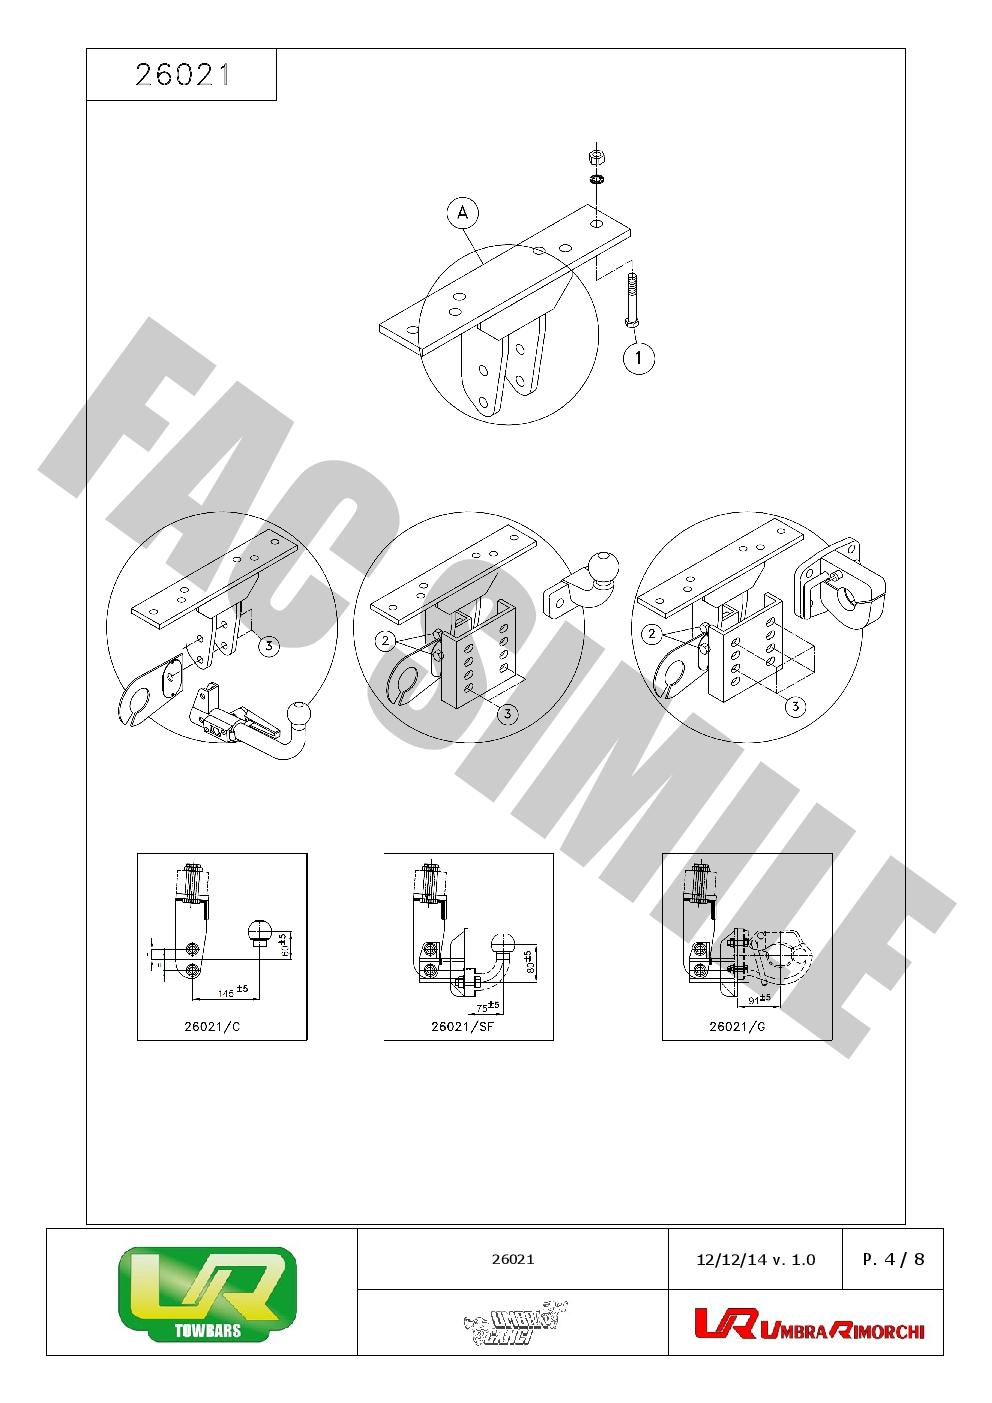 Bola Remolque Placa + Kit C2 7p para Nissan PATHFINDER 4WD